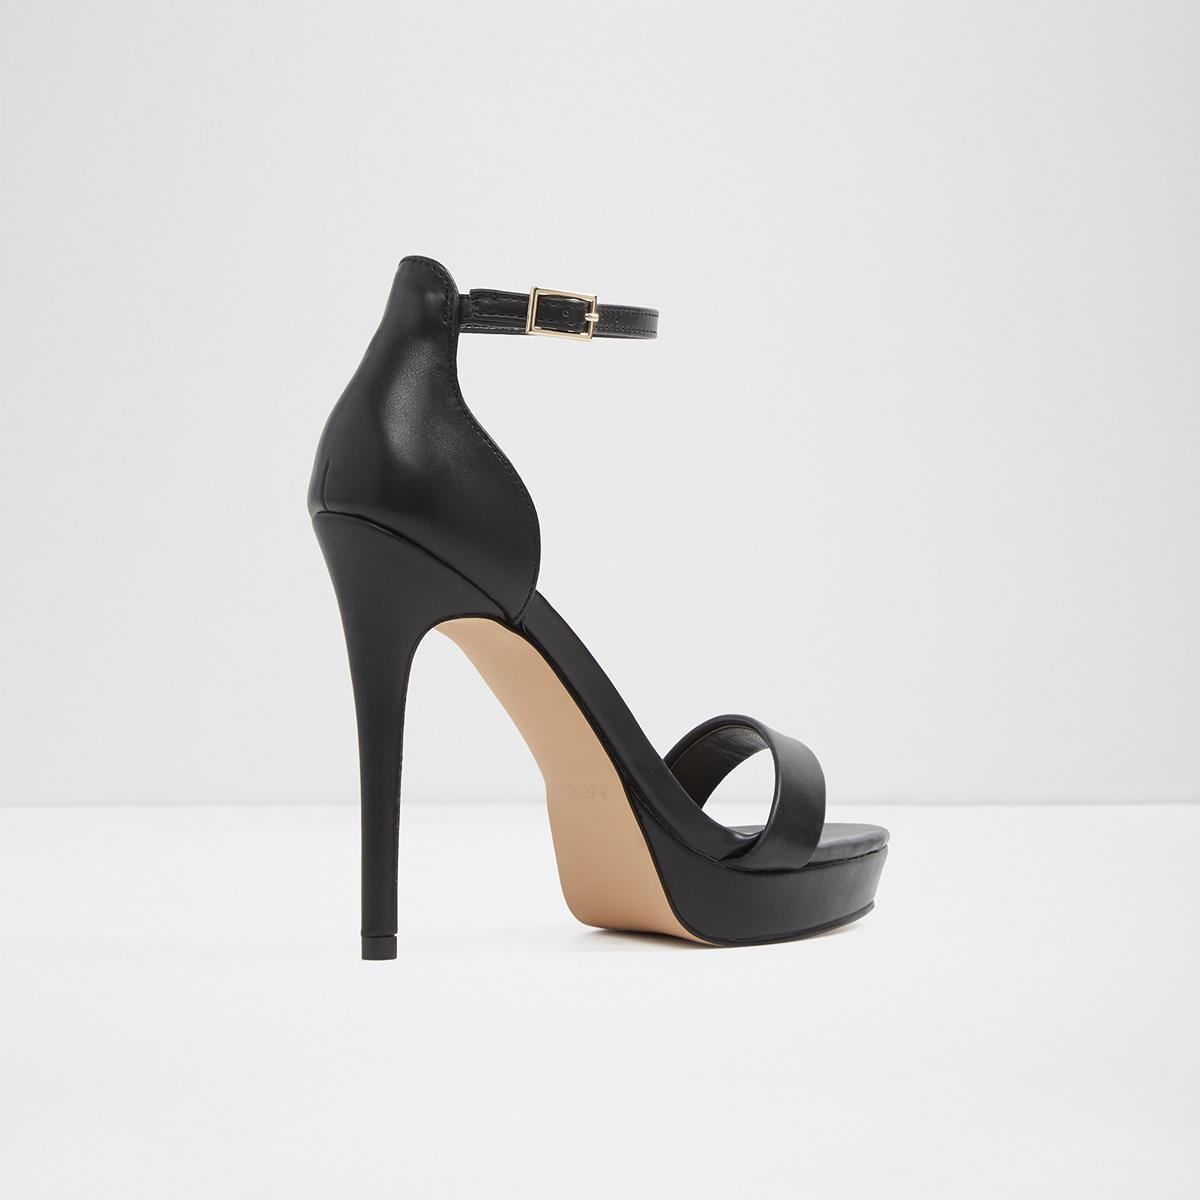 d127b716e204 Madalene Black Women s Platform sandals